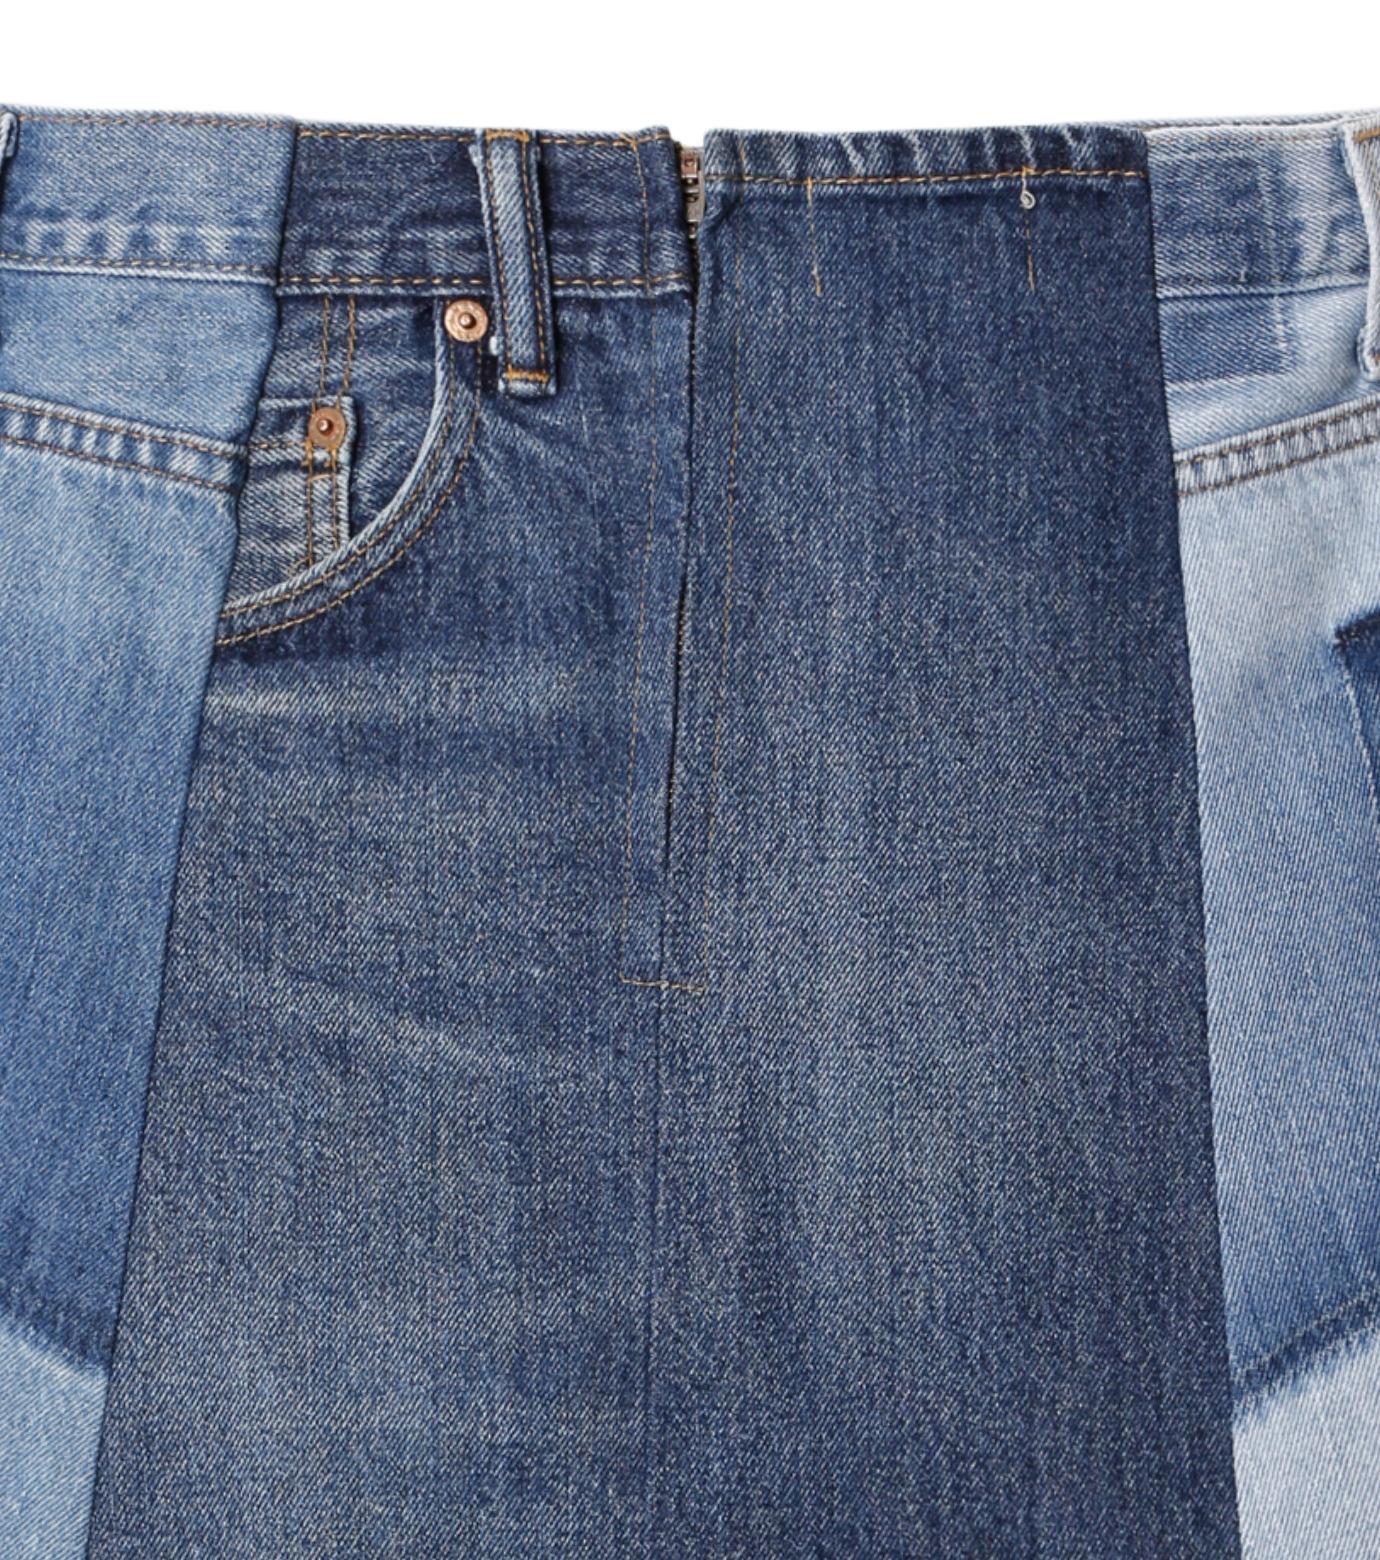 77circa(77サーカ)のFringe Denim Skirt-INDIGO(スカート/skirt)-cc16ss-49-94 拡大詳細画像4